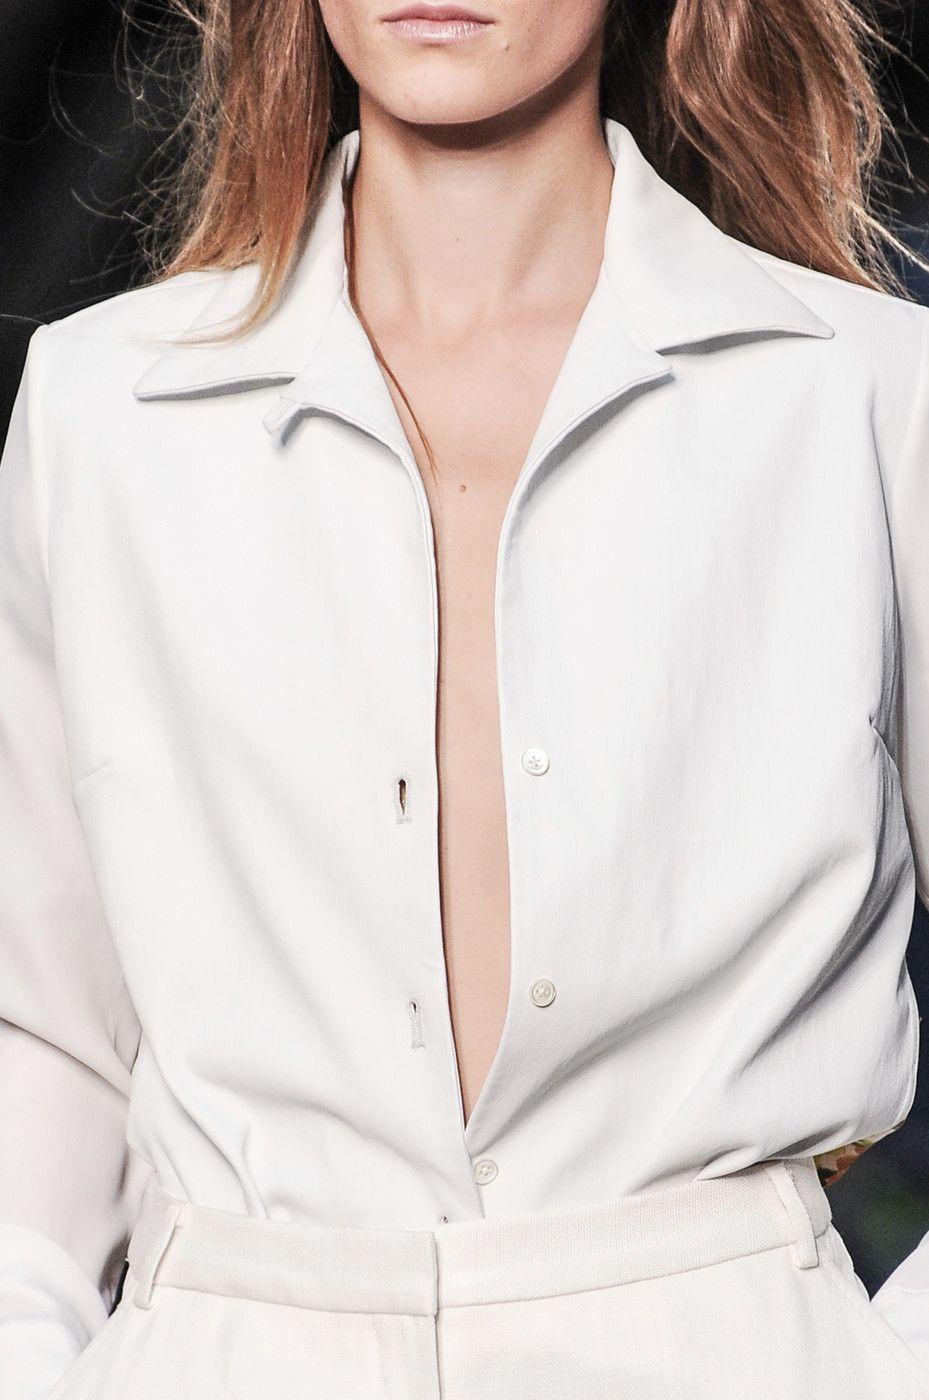 Paul Smith SS14 | Minimal + Chic | camisa escotada´+ blanco